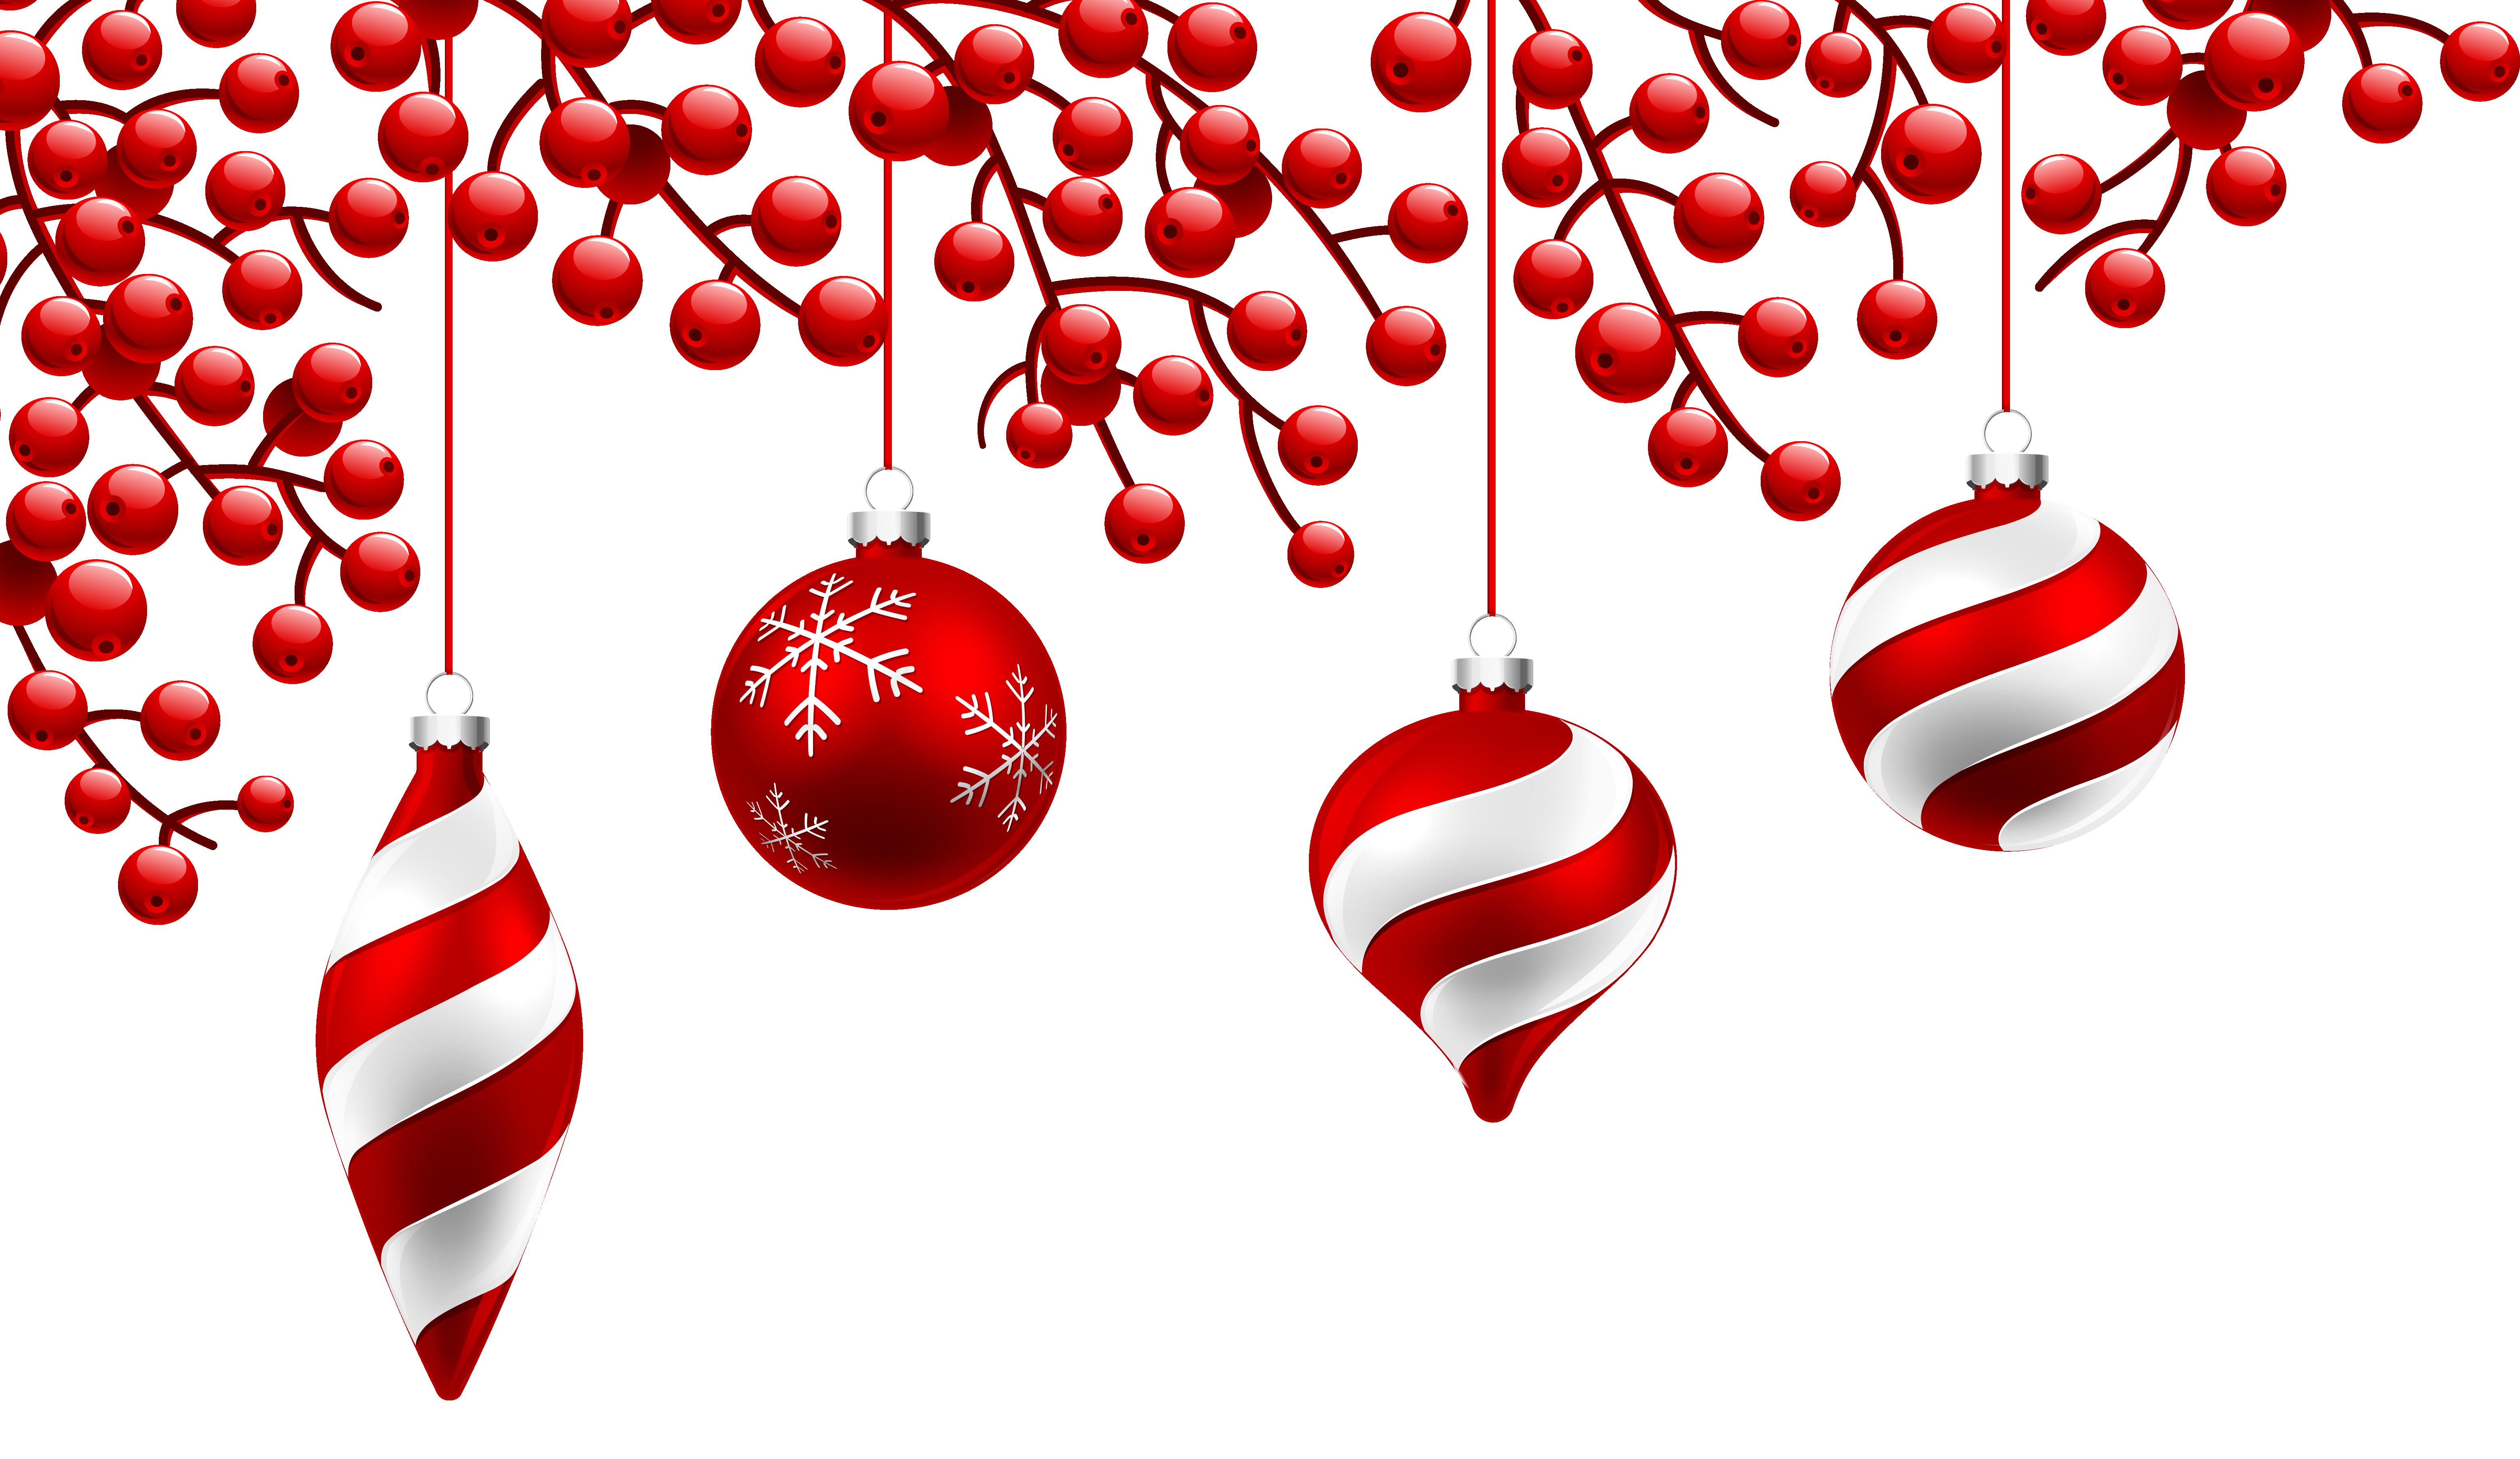 Christmas clipart vector jpg transparent stock Xmas Decorations Clipart & Xmas Decorations Clip Art Images #13599 ... jpg transparent stock